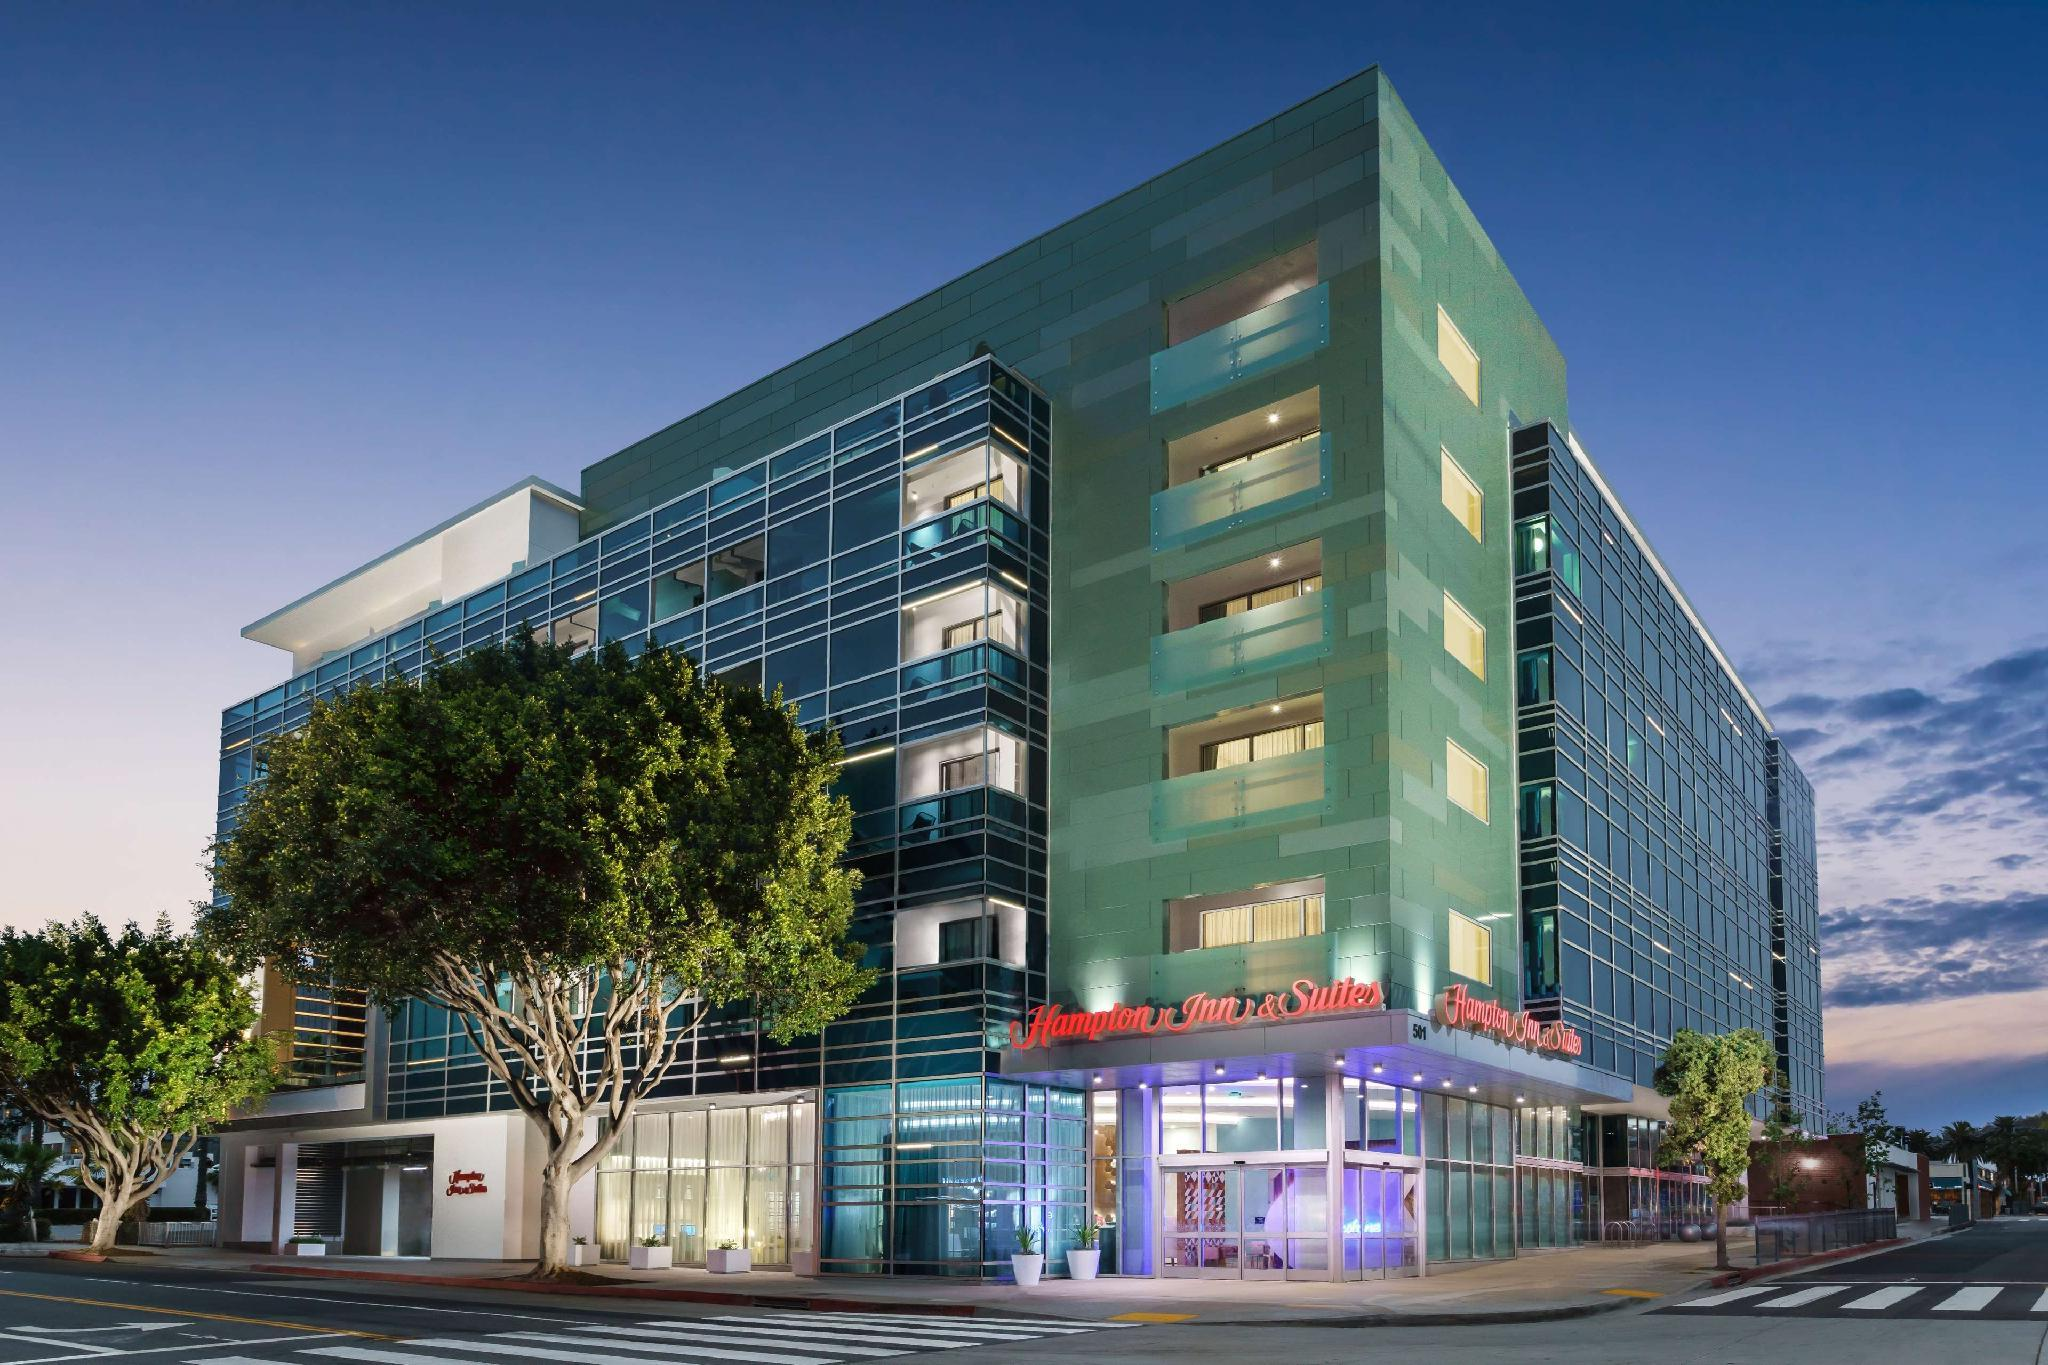 Hampton Inn And Suites Santa Monica